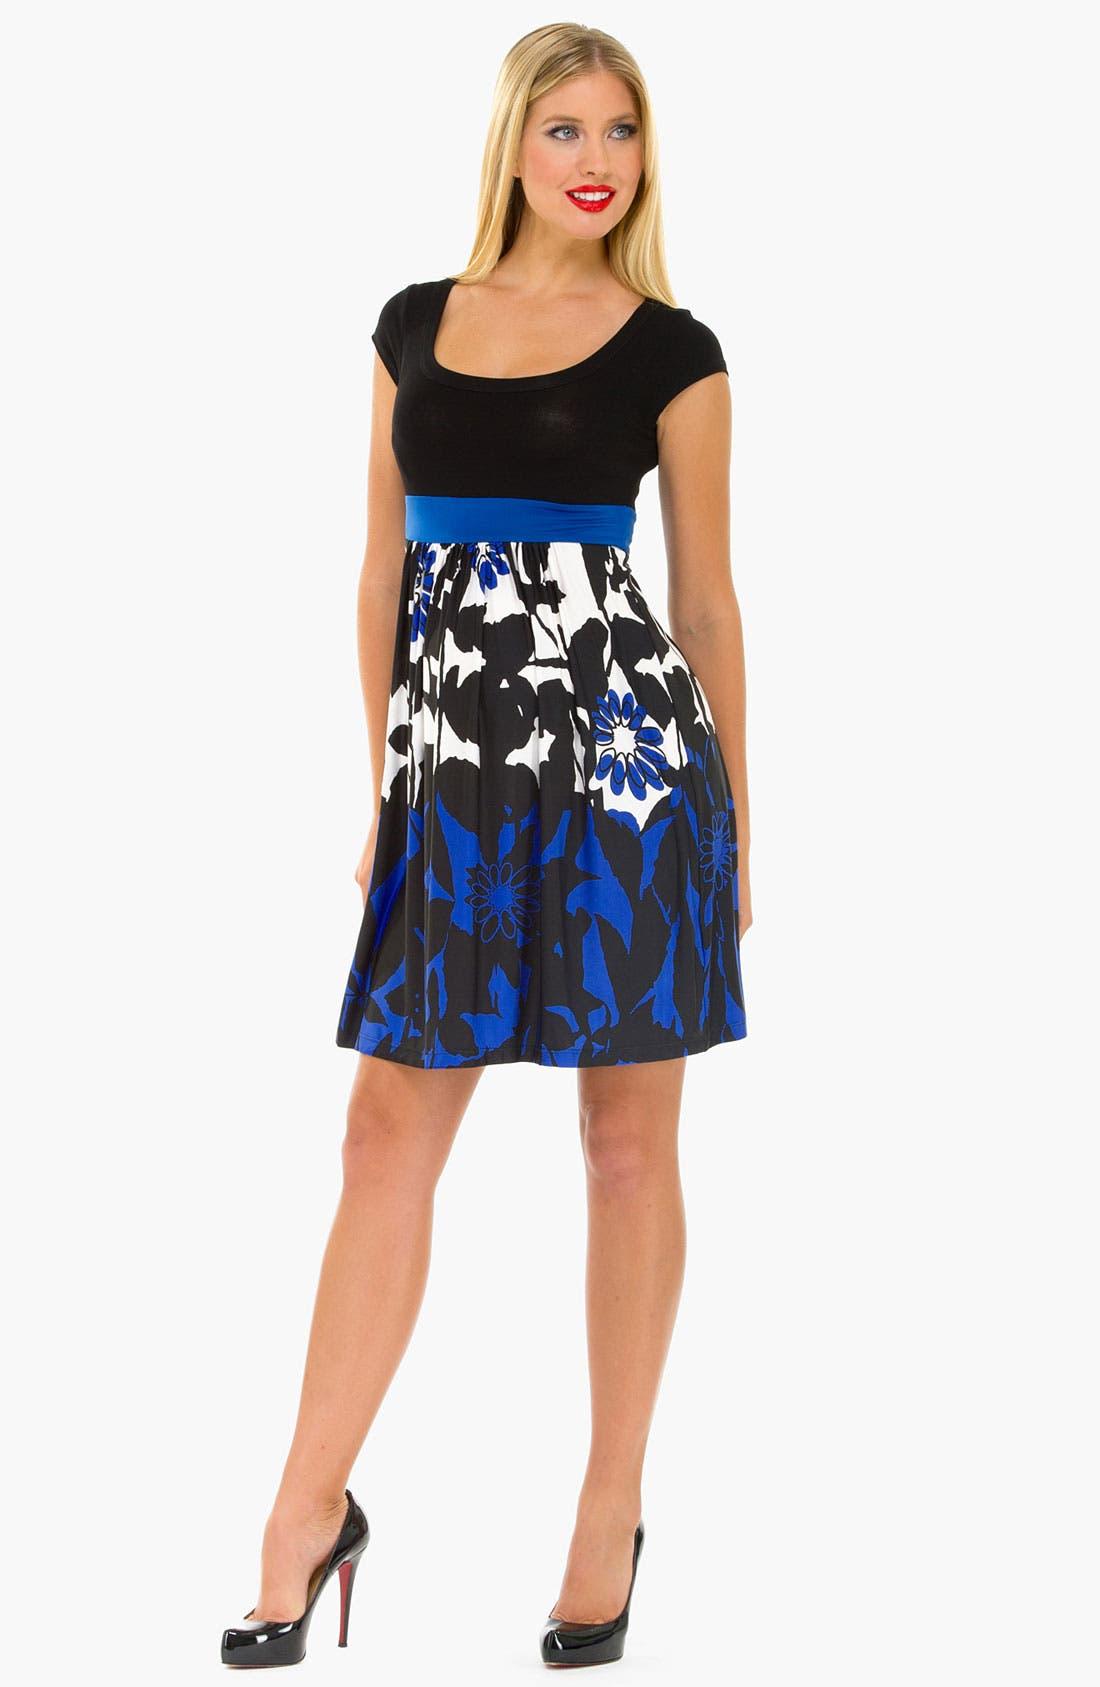 Alternate Image 1 Selected - Olian 'Arabesque' Print Maternity Dress